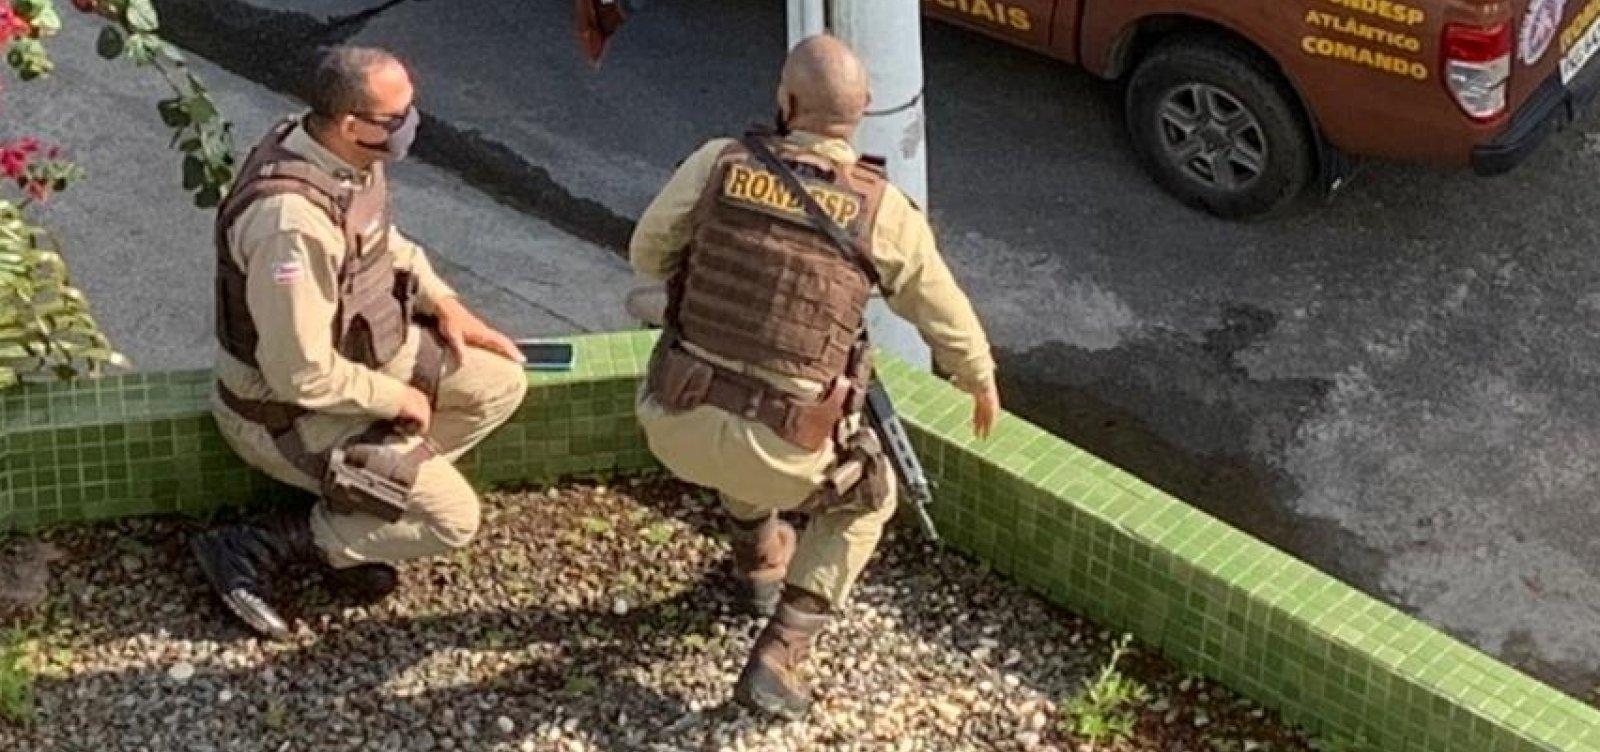 Bandido é baleado durante troca de tiros com a Rondesp no campus da Ufba